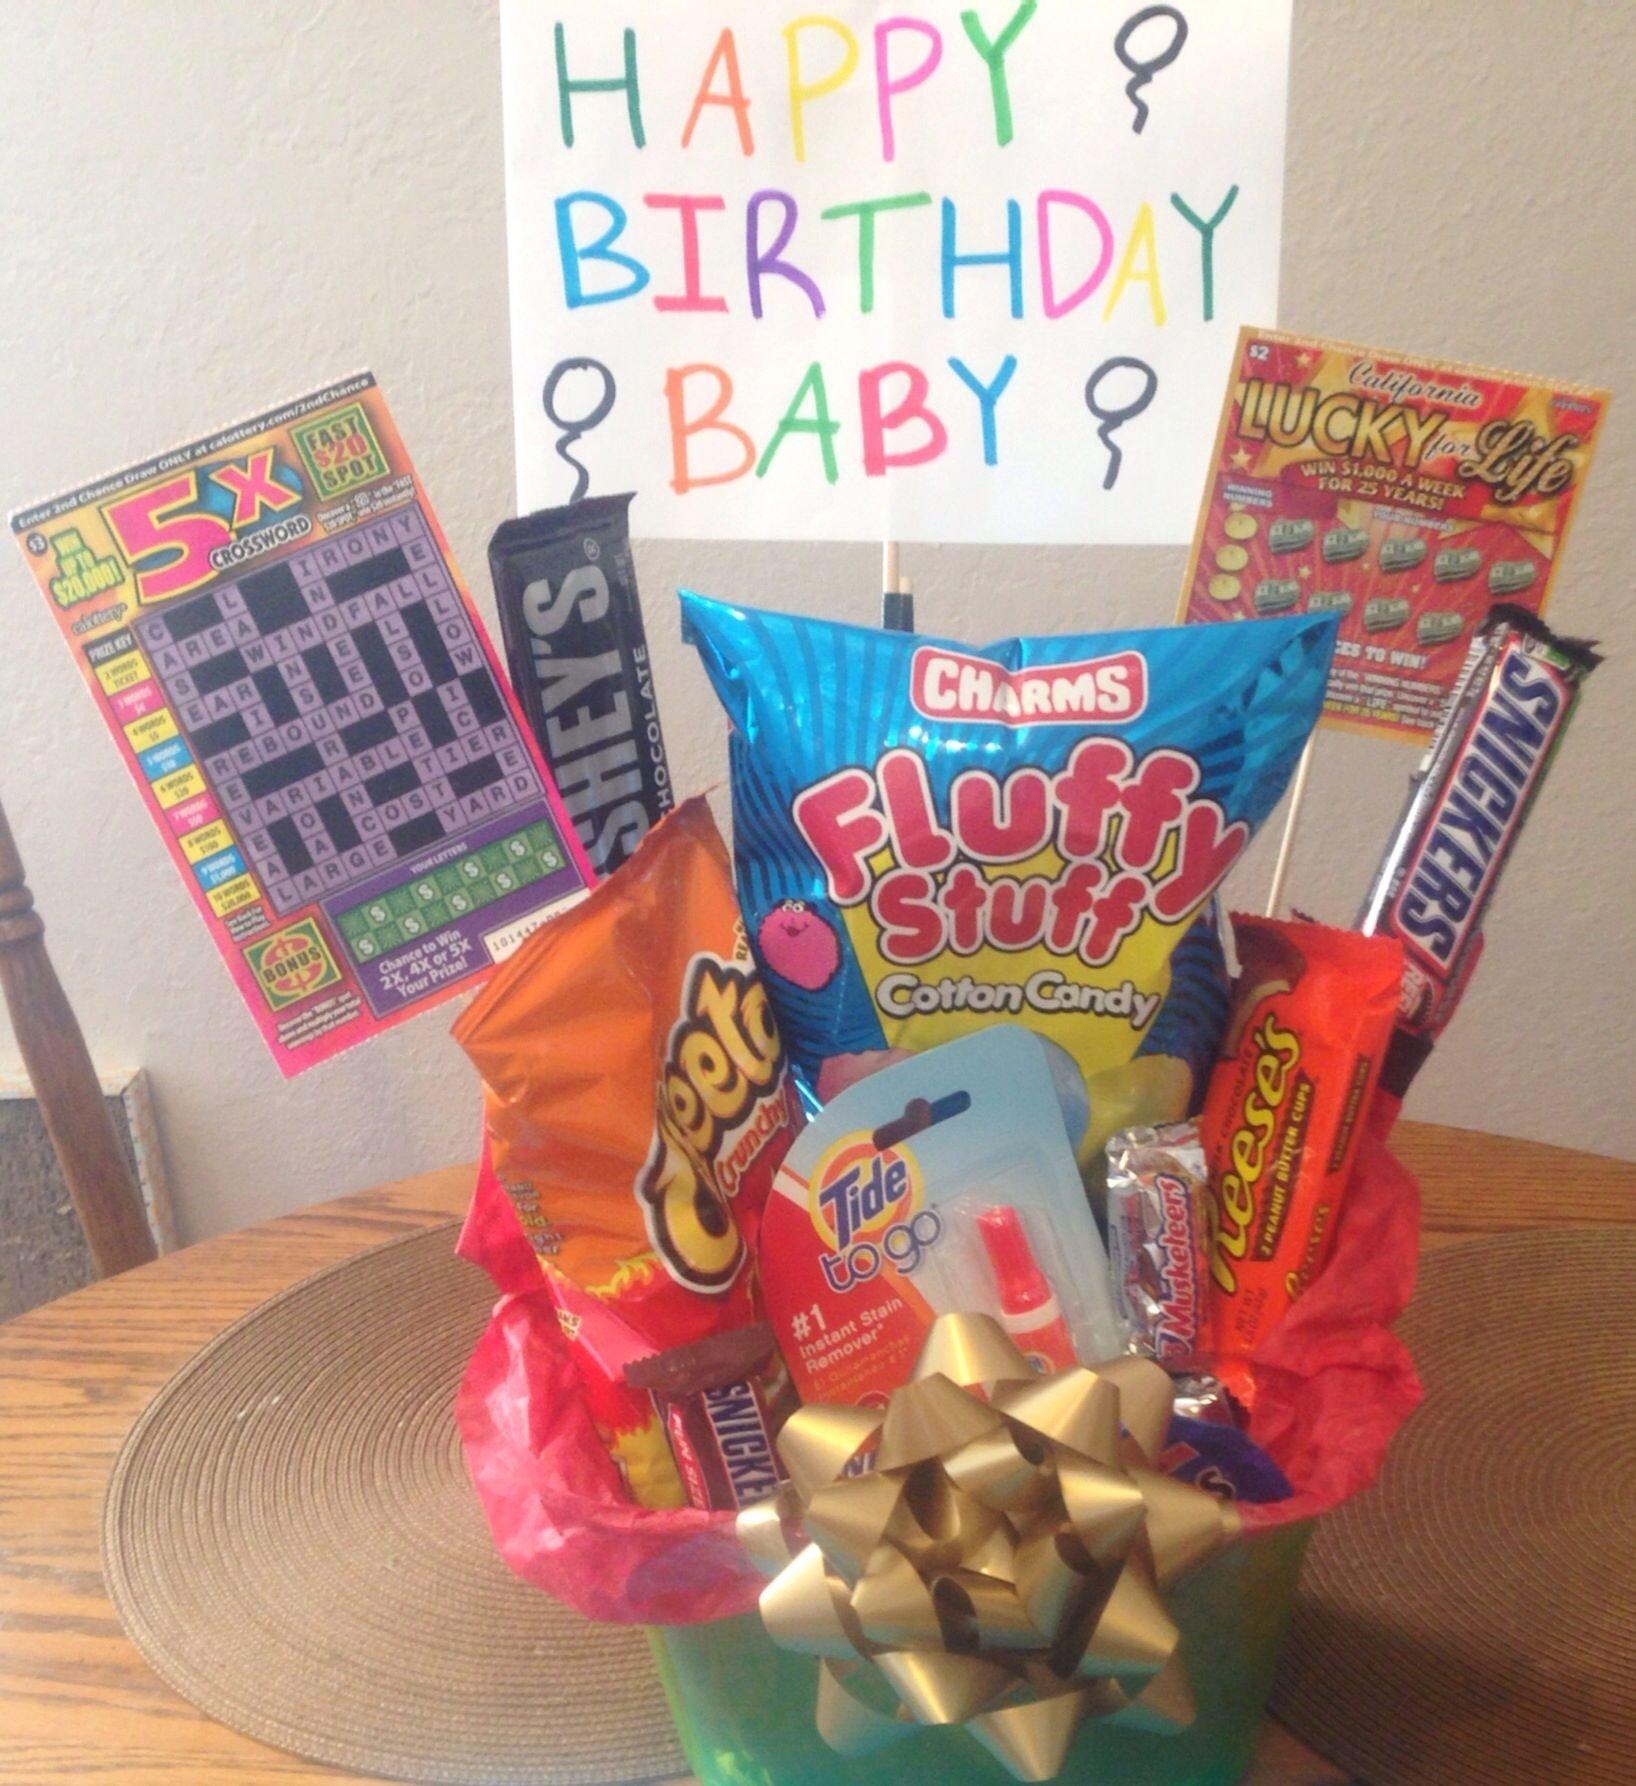 10 Unique Birthday Ideas For Your Boyfriend for my boyfriends 22nd birthday my projects pinterest 22 birthday 10 2020